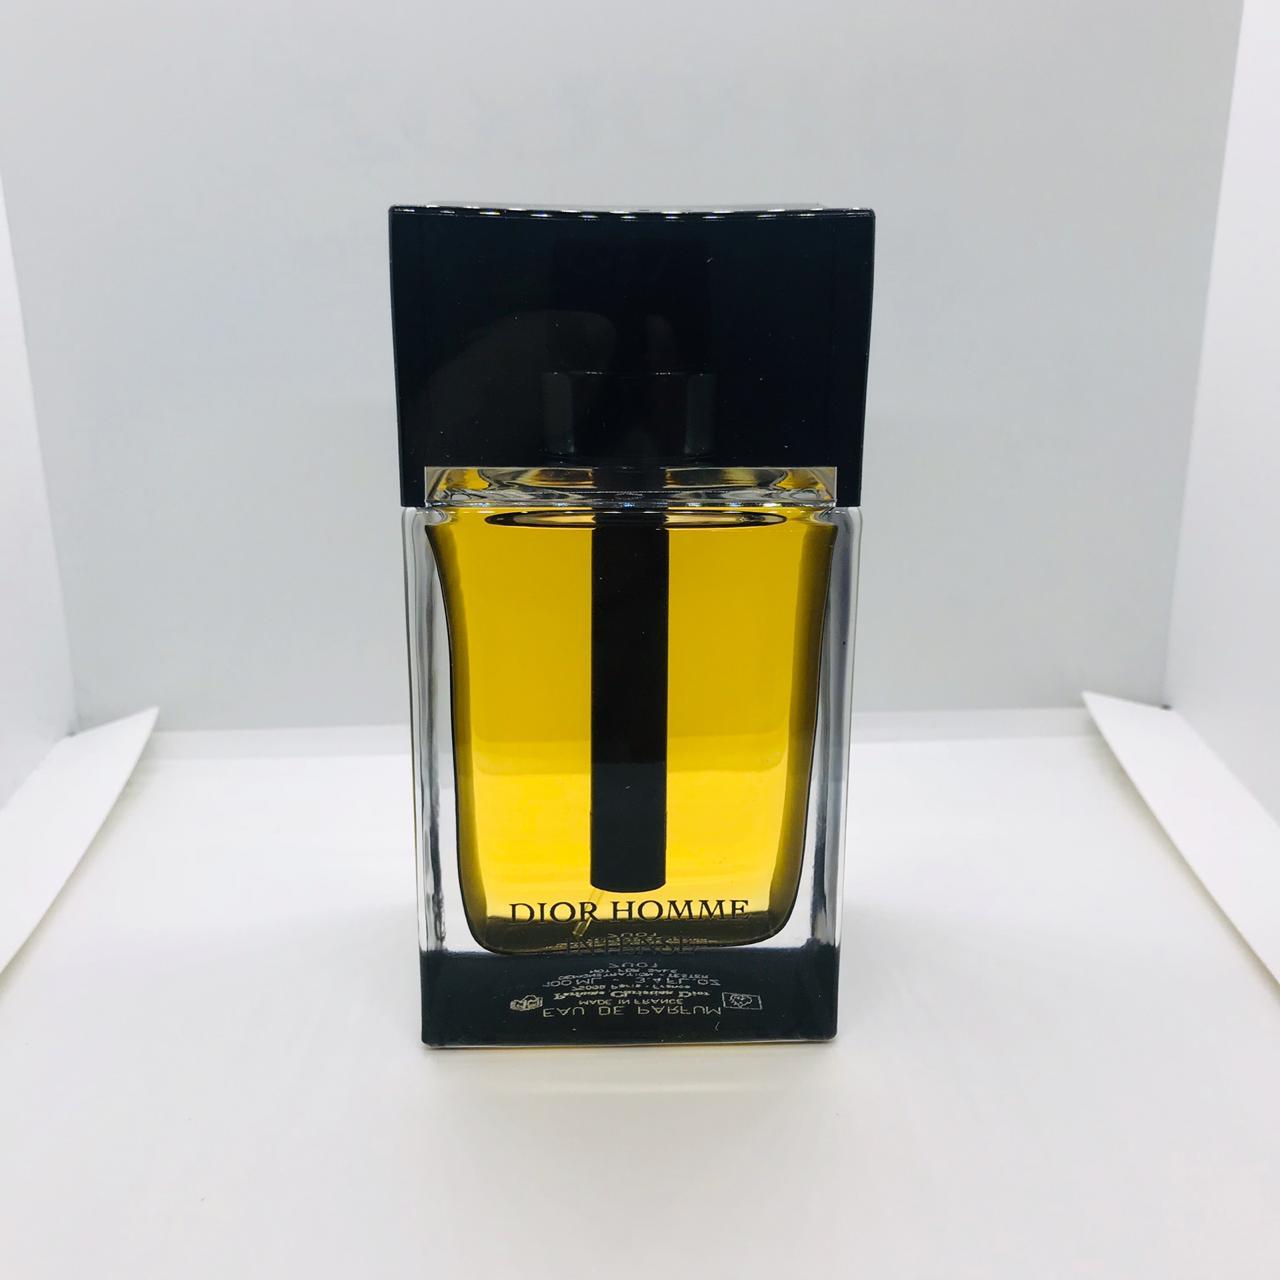 c406d10a206 Homme Intense Dior Masculino Eau de Parfum 100ml - Tester - Easy ...